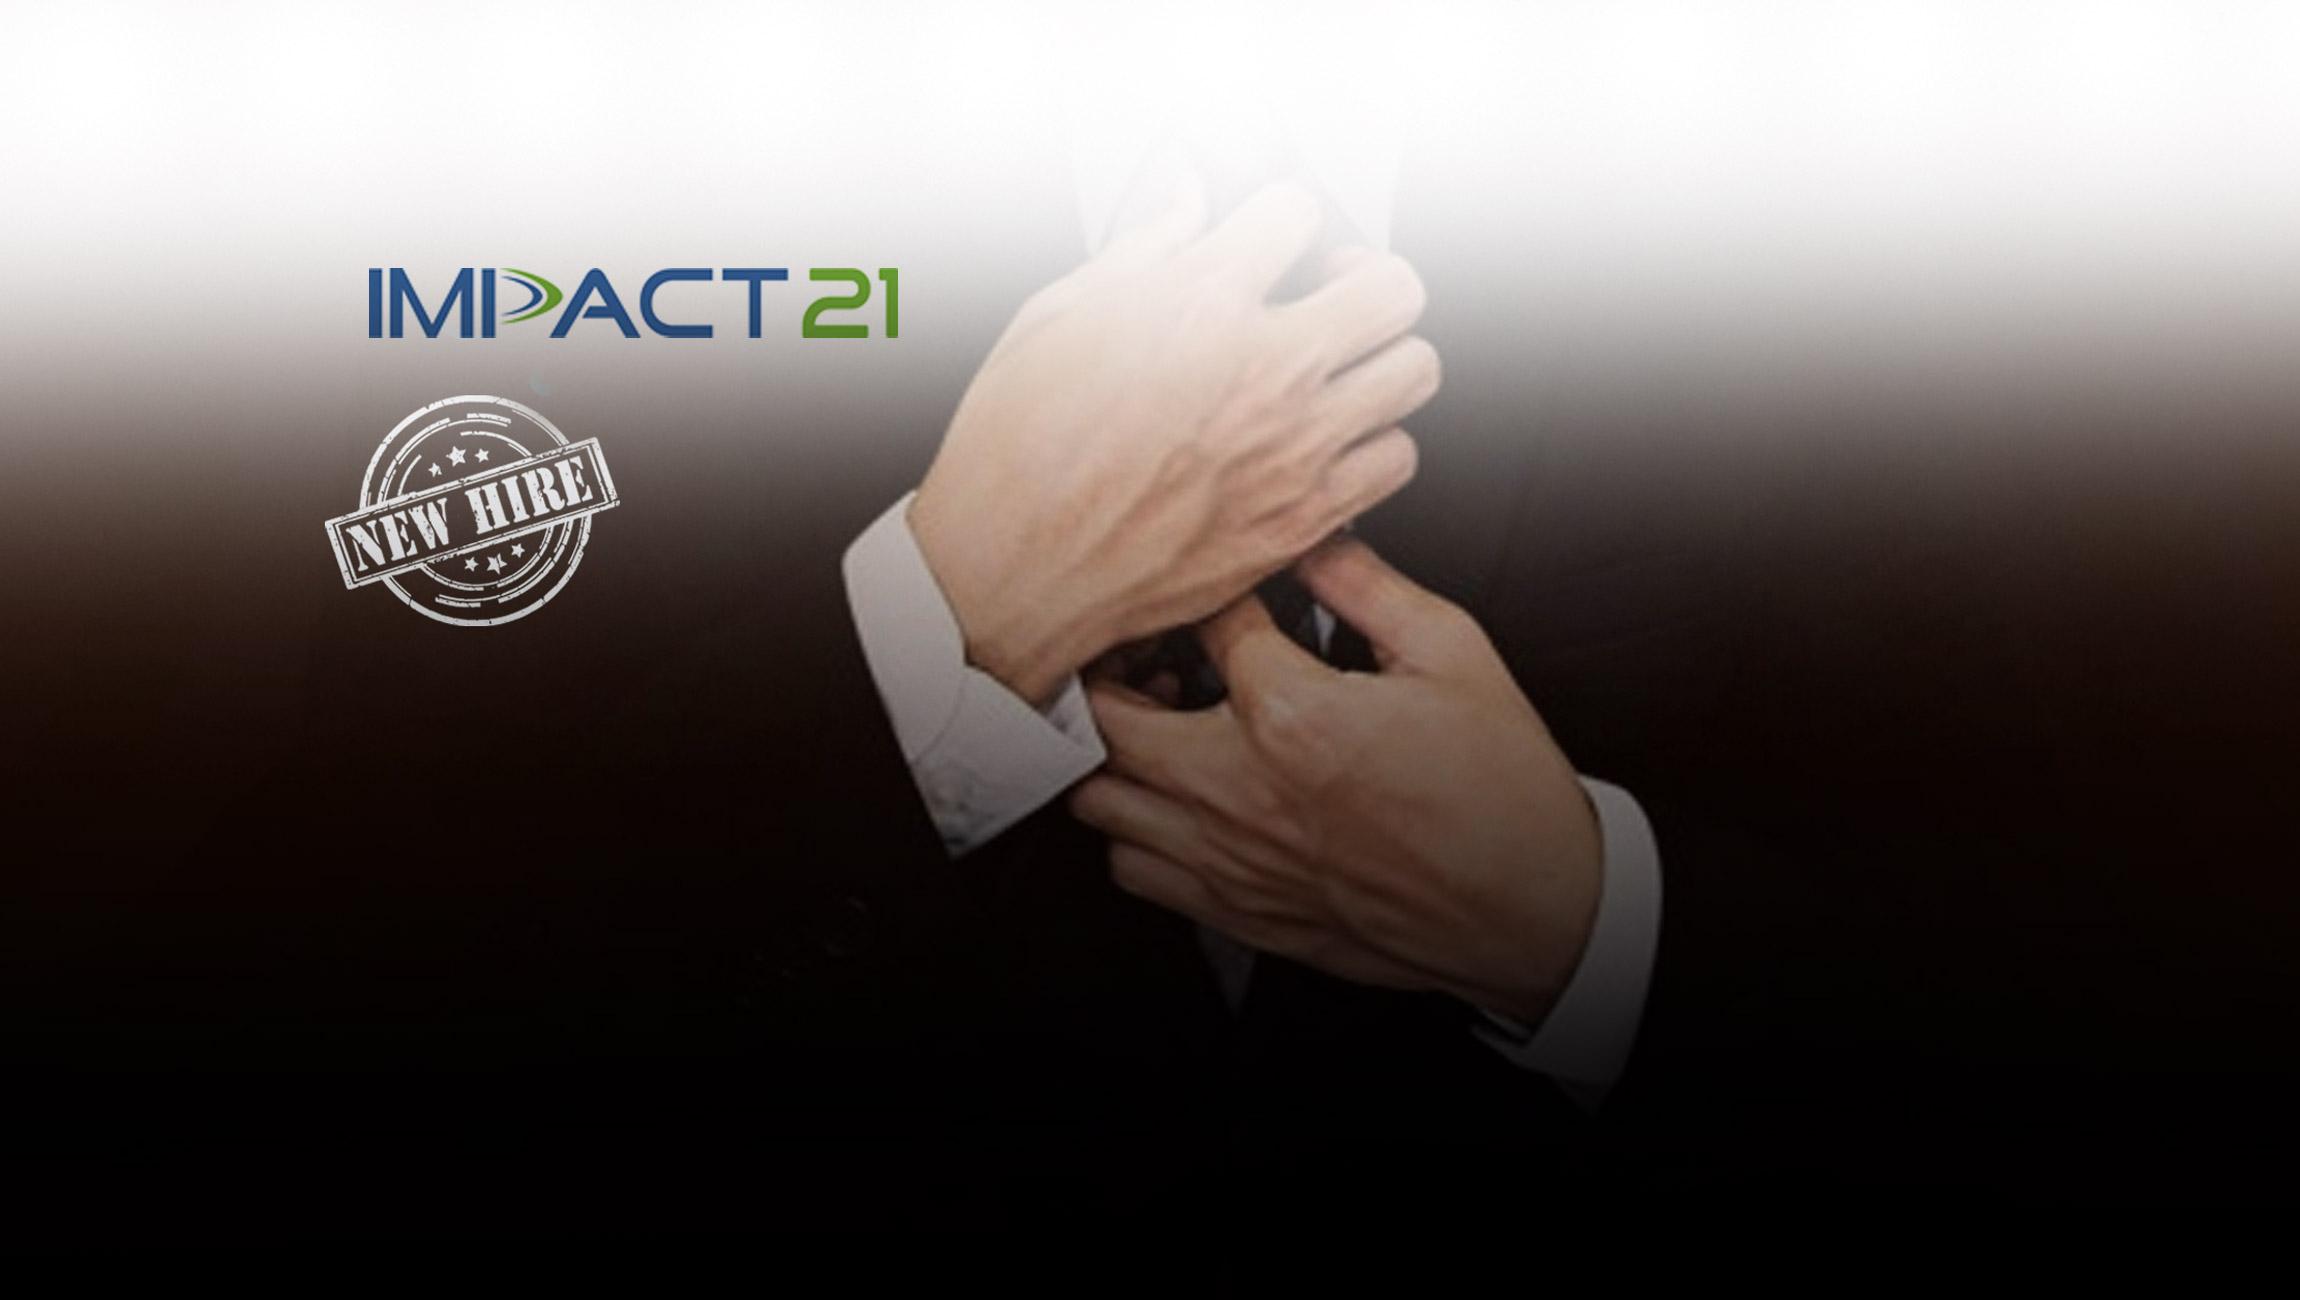 Impact 21 Welcomes Tom Newbould as New Senior Principal Consultant